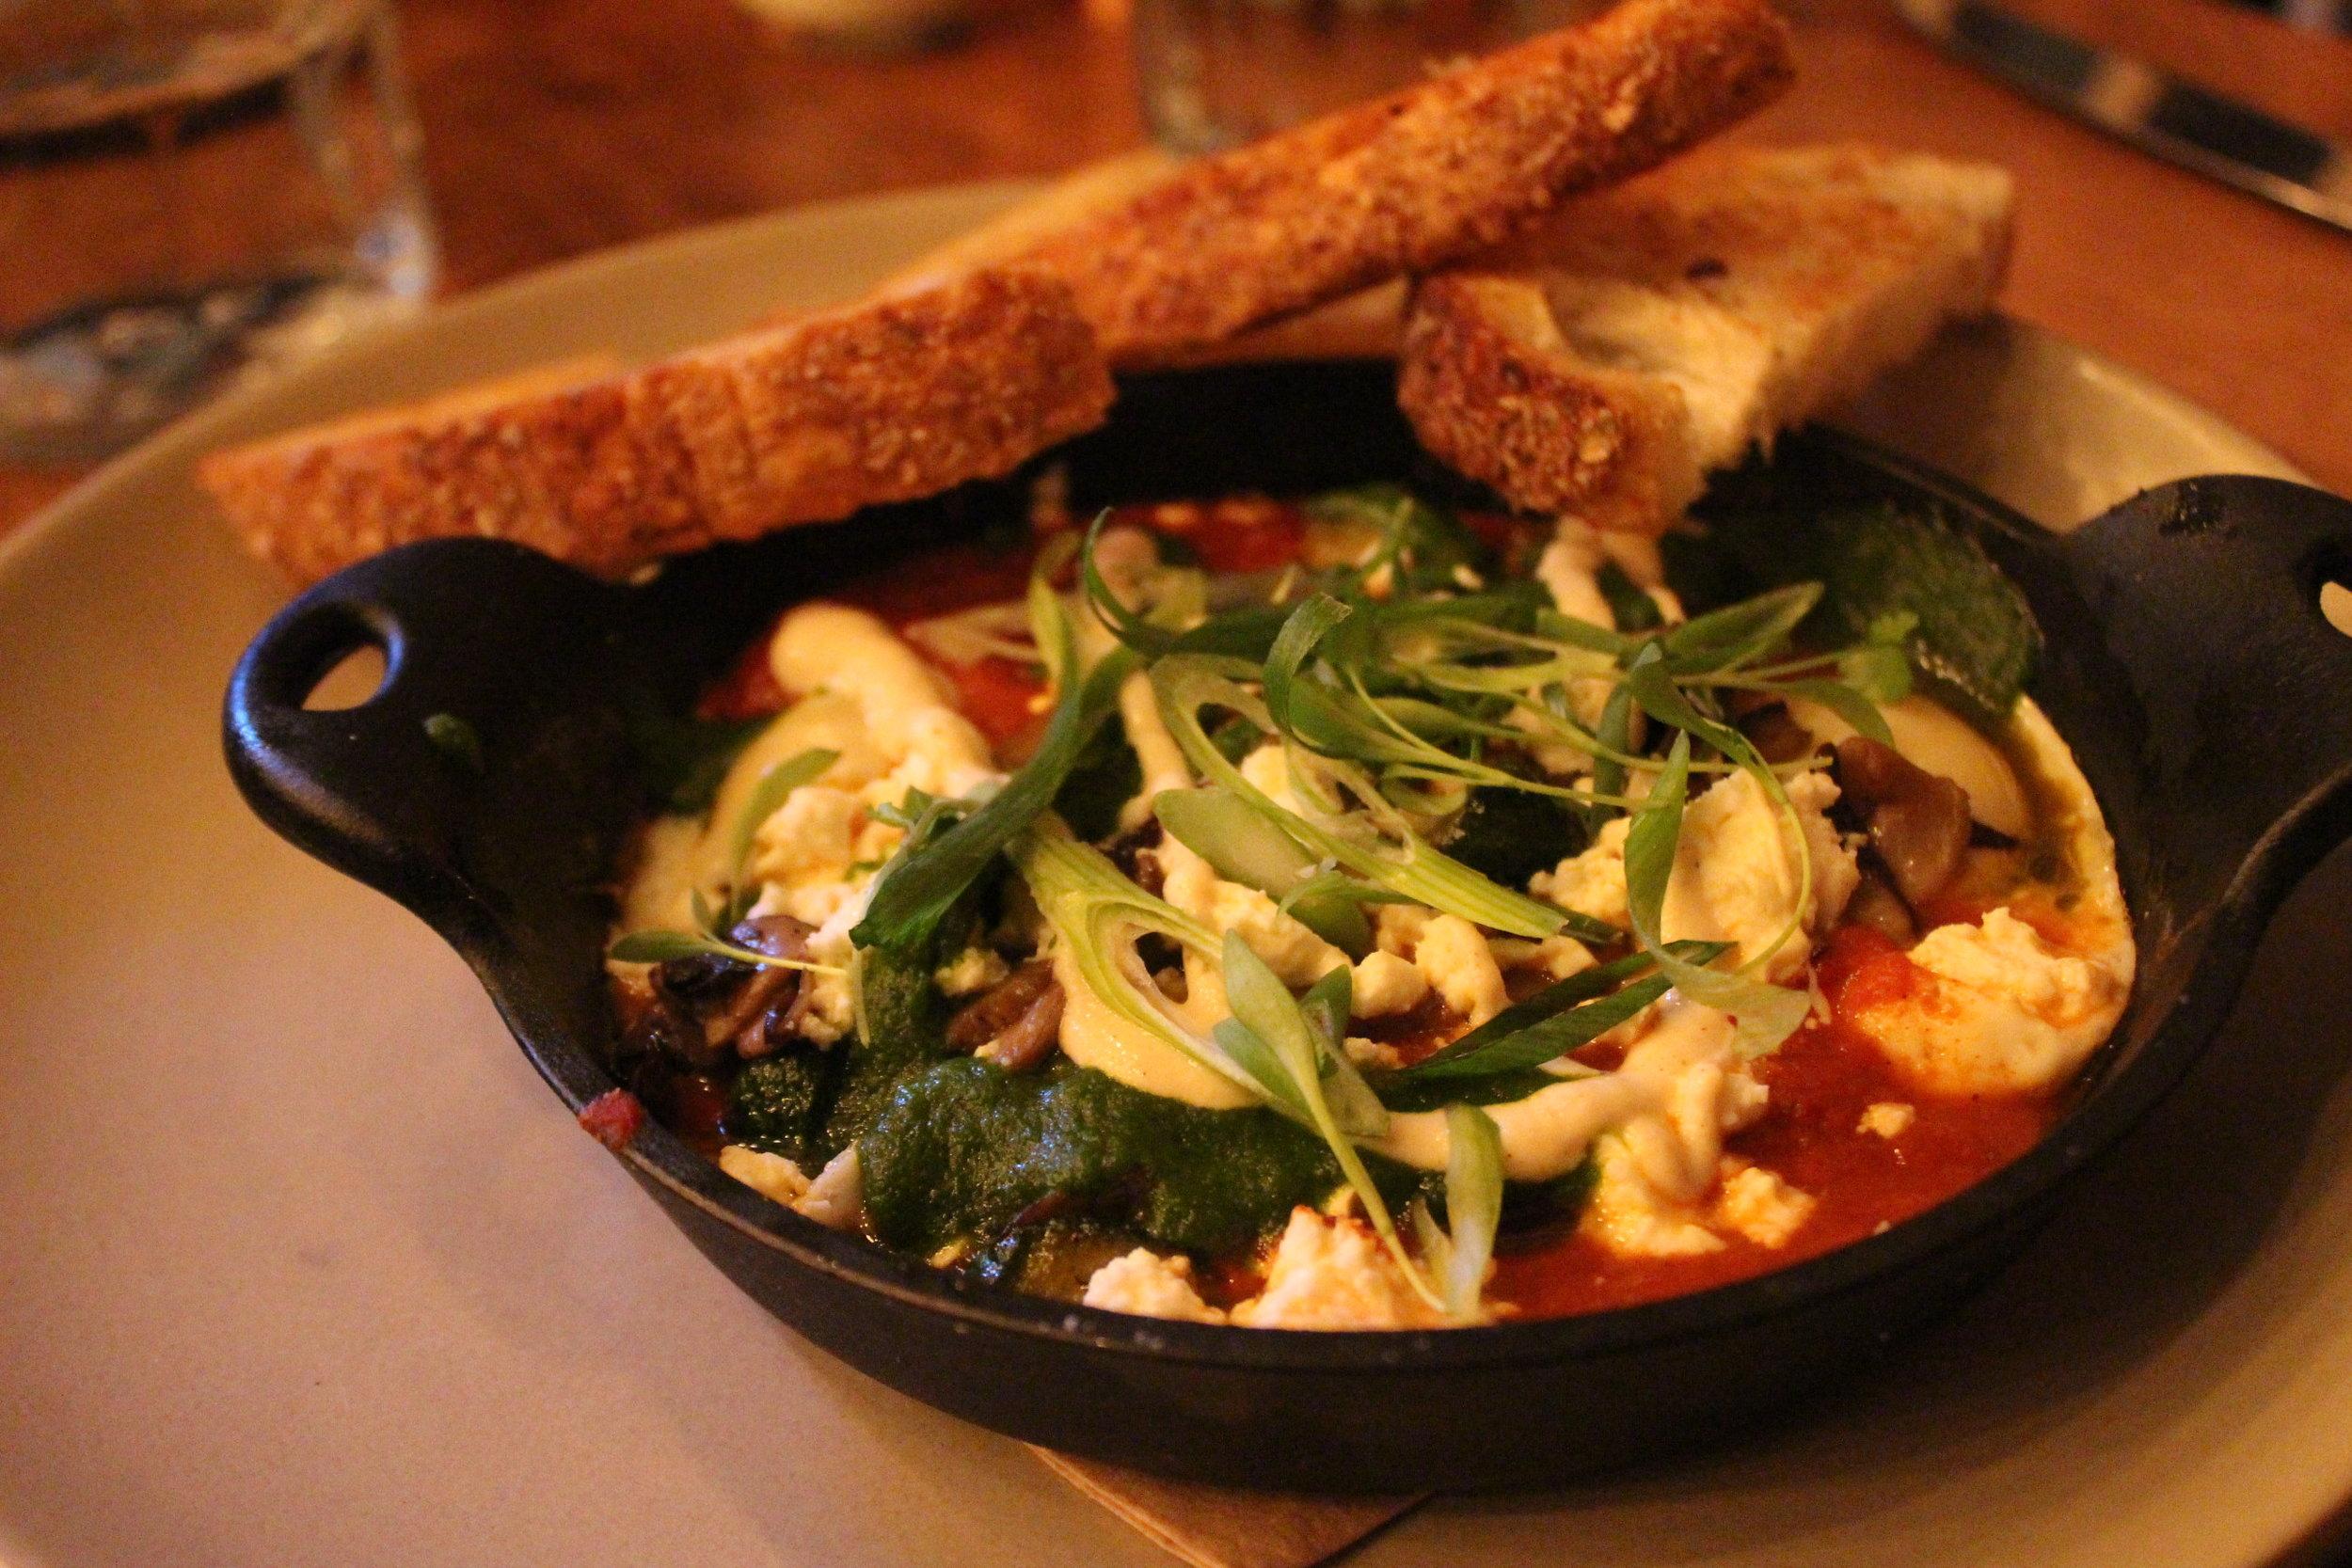 Shakshuka Egg Cast Iron Skillet (Spiced Tomato Sauce, Charred Garlic Yogurt, Herb Chutney, Feta Cheese, Zucchini, Mushrooms)